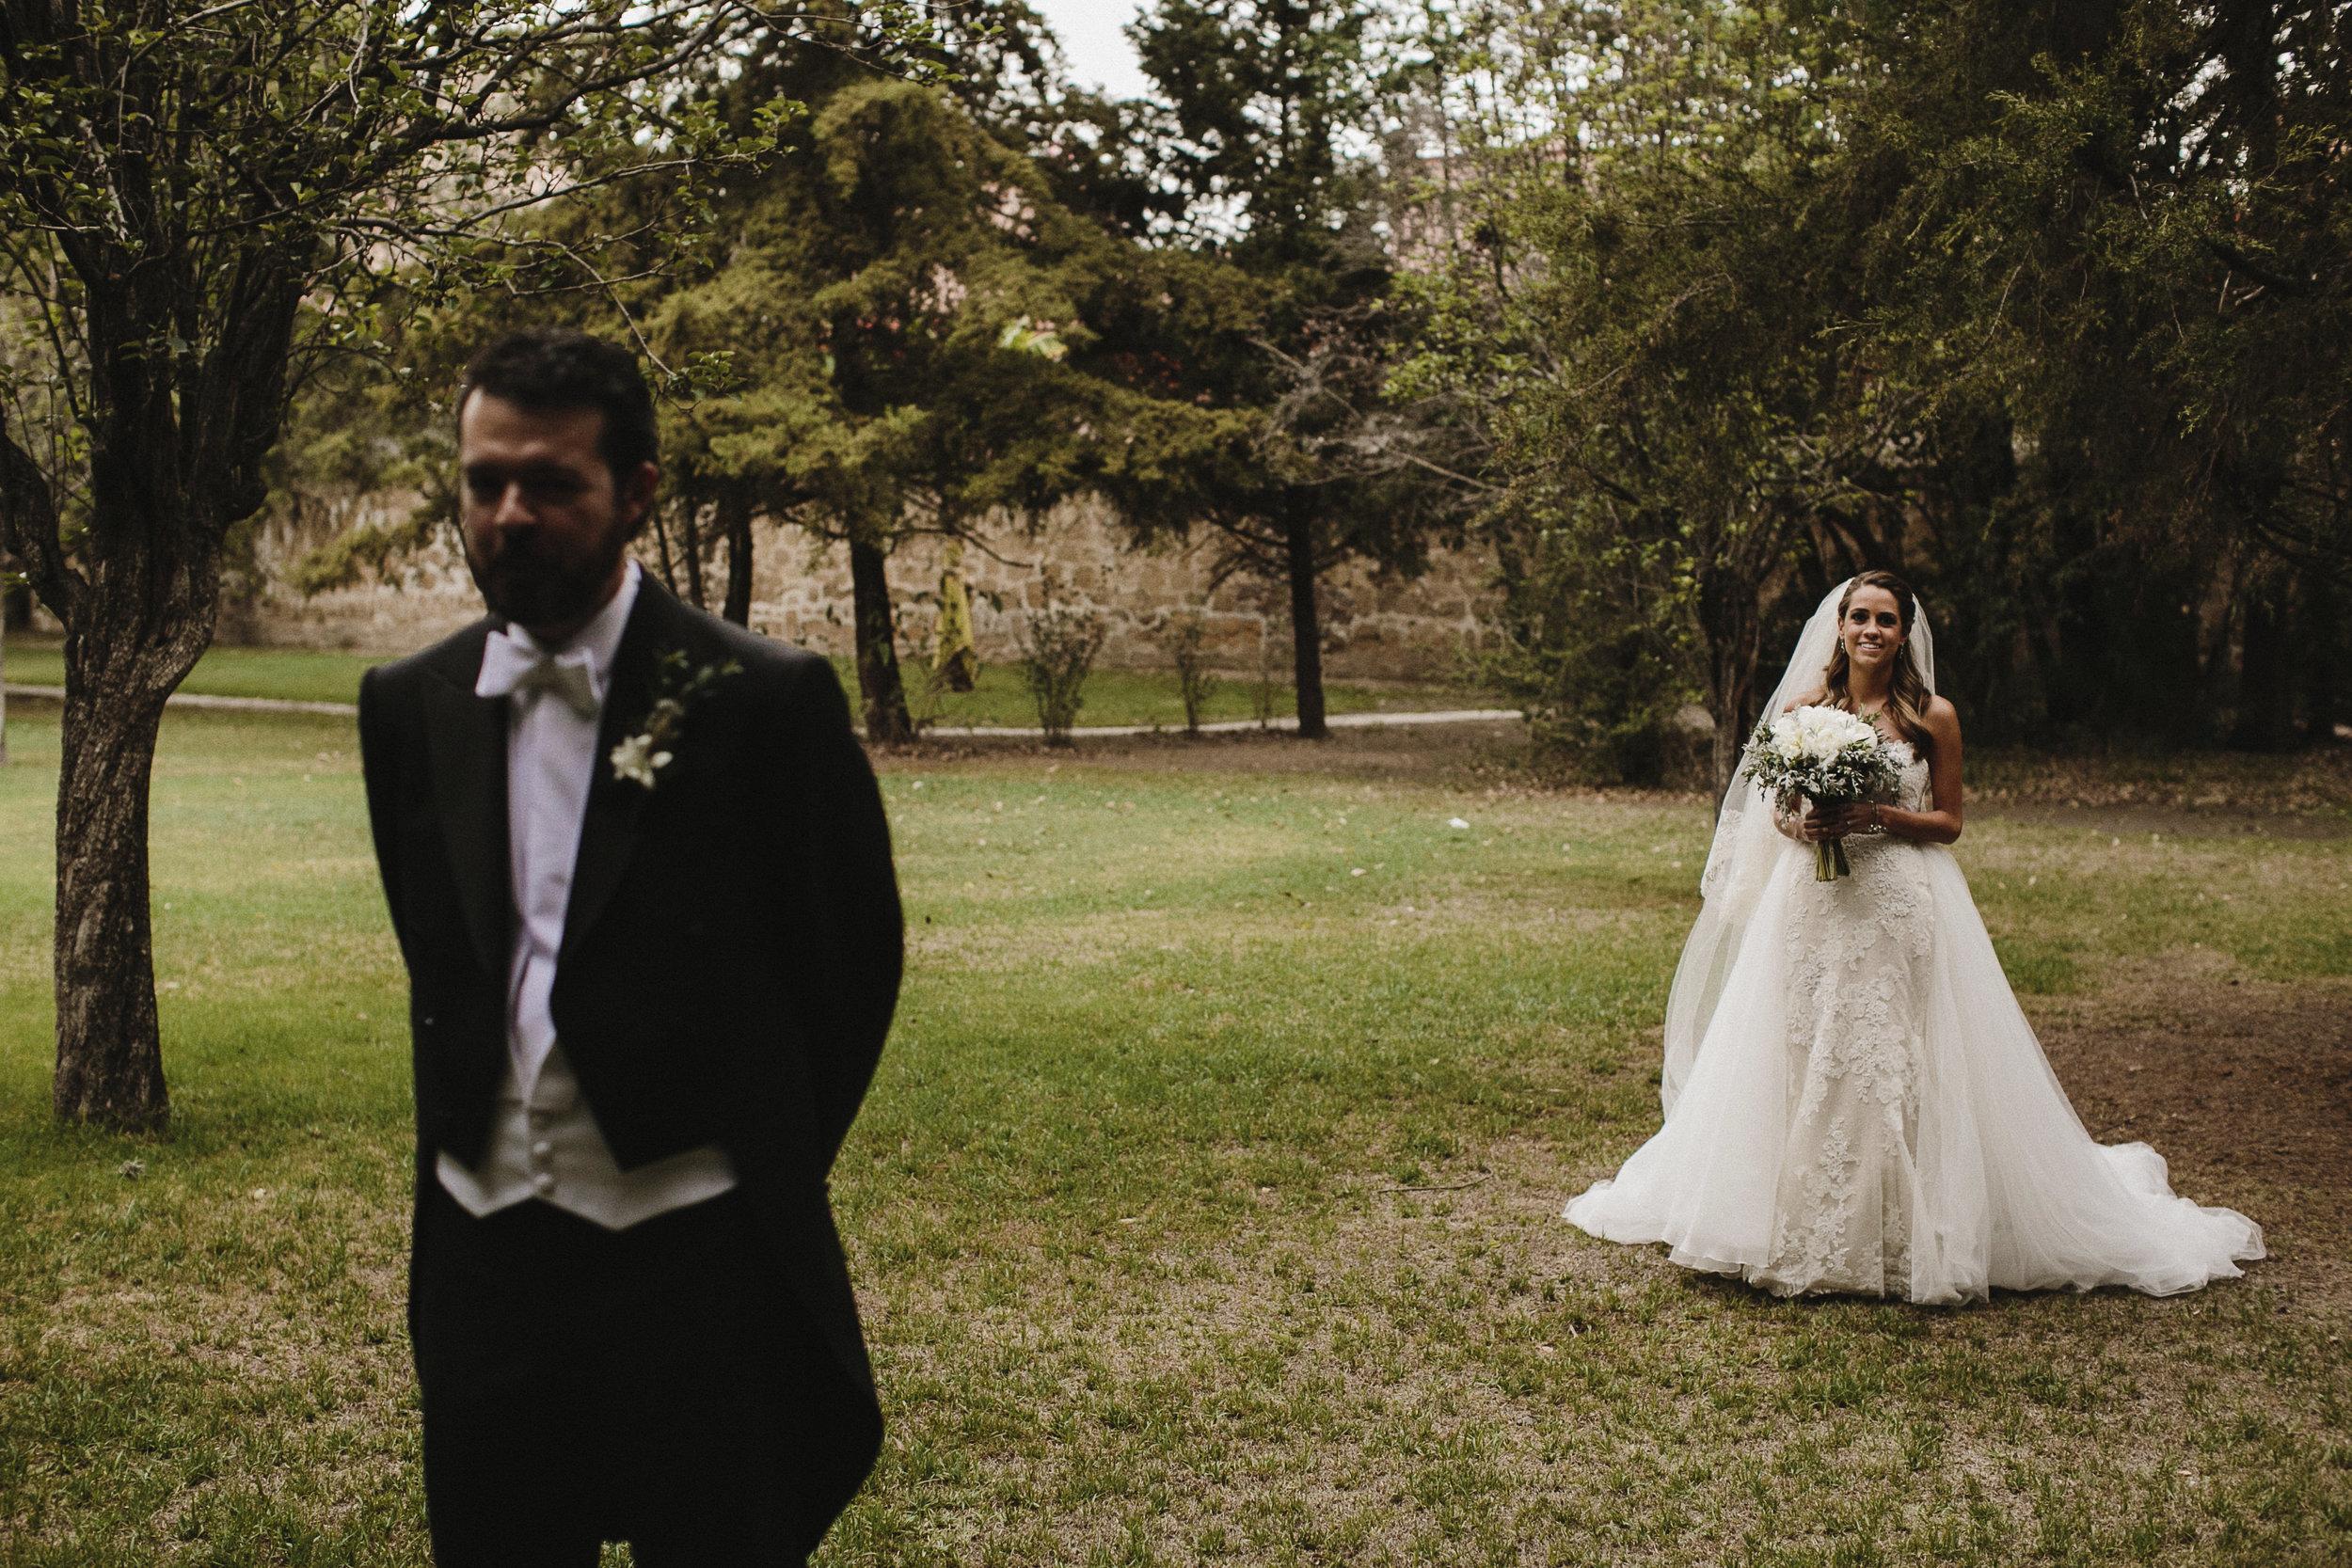 alfonso_flores_destination_wedding_photogrpahy_paola_alonso-163.JPG